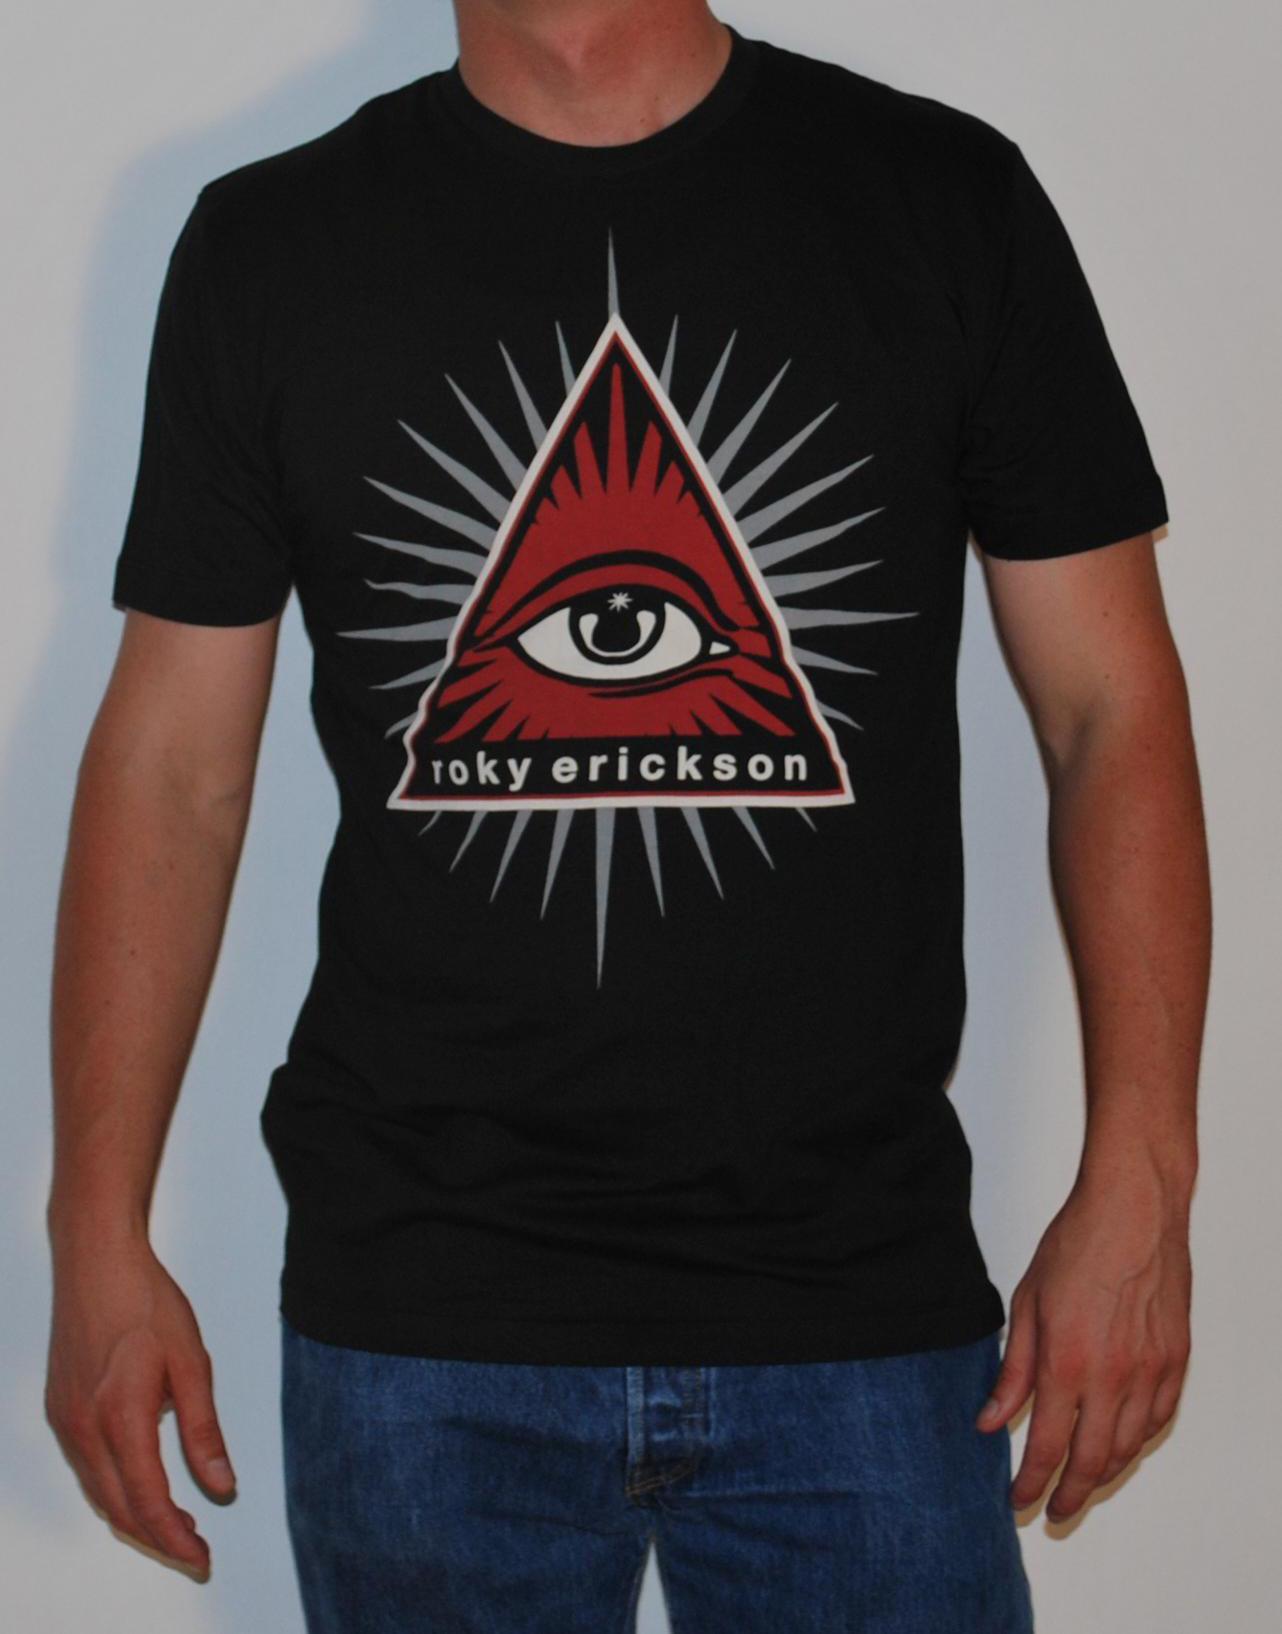 Roky Erickson- Pyramid on a black shirt (Sale price!)